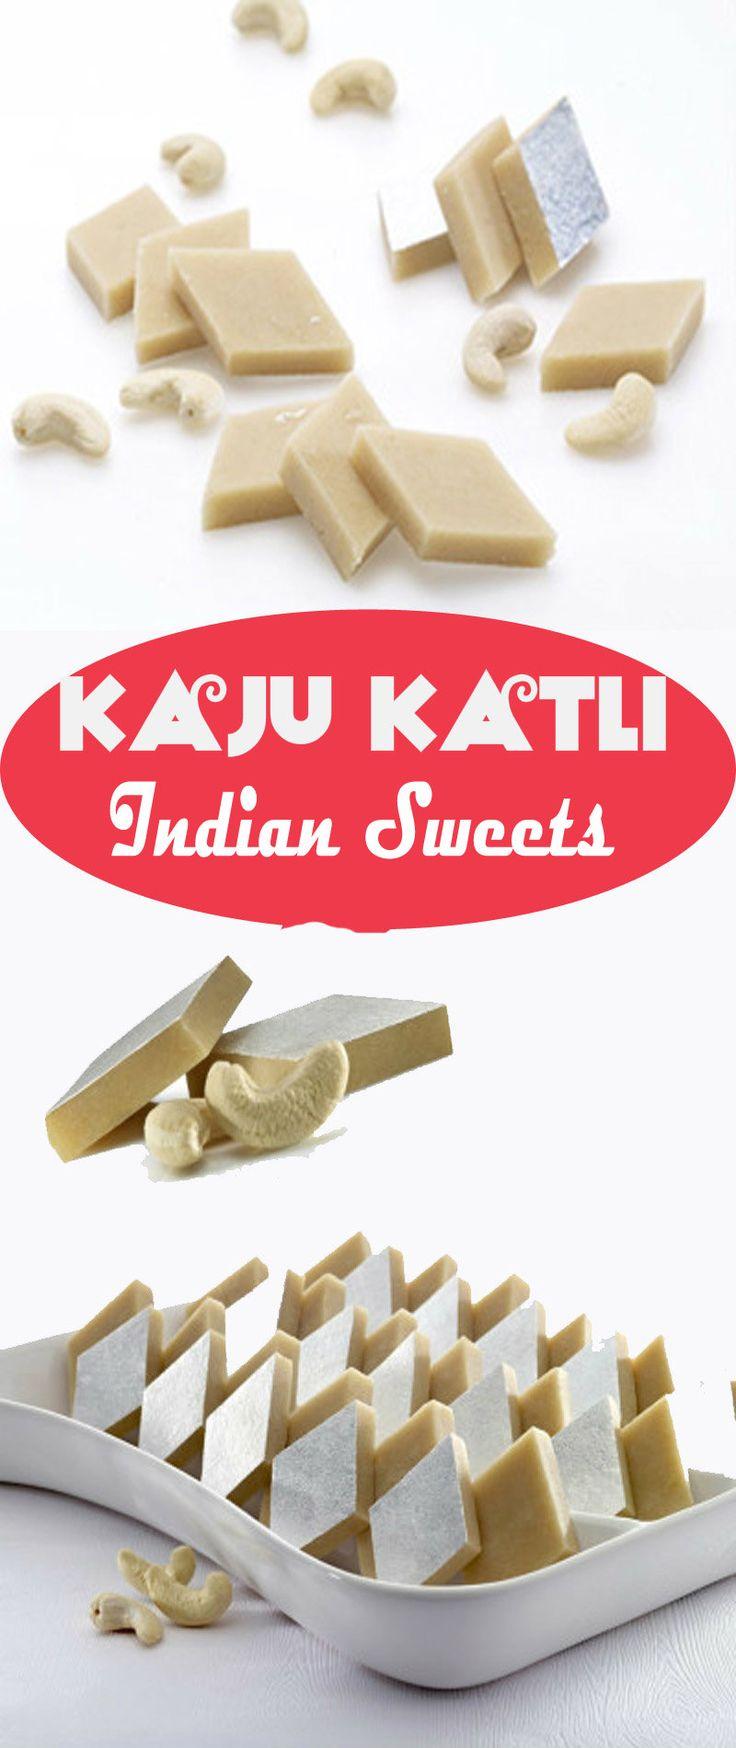 - ♥   ♥  #kajukatli  #cashewnutsfudge  #Indiansweets